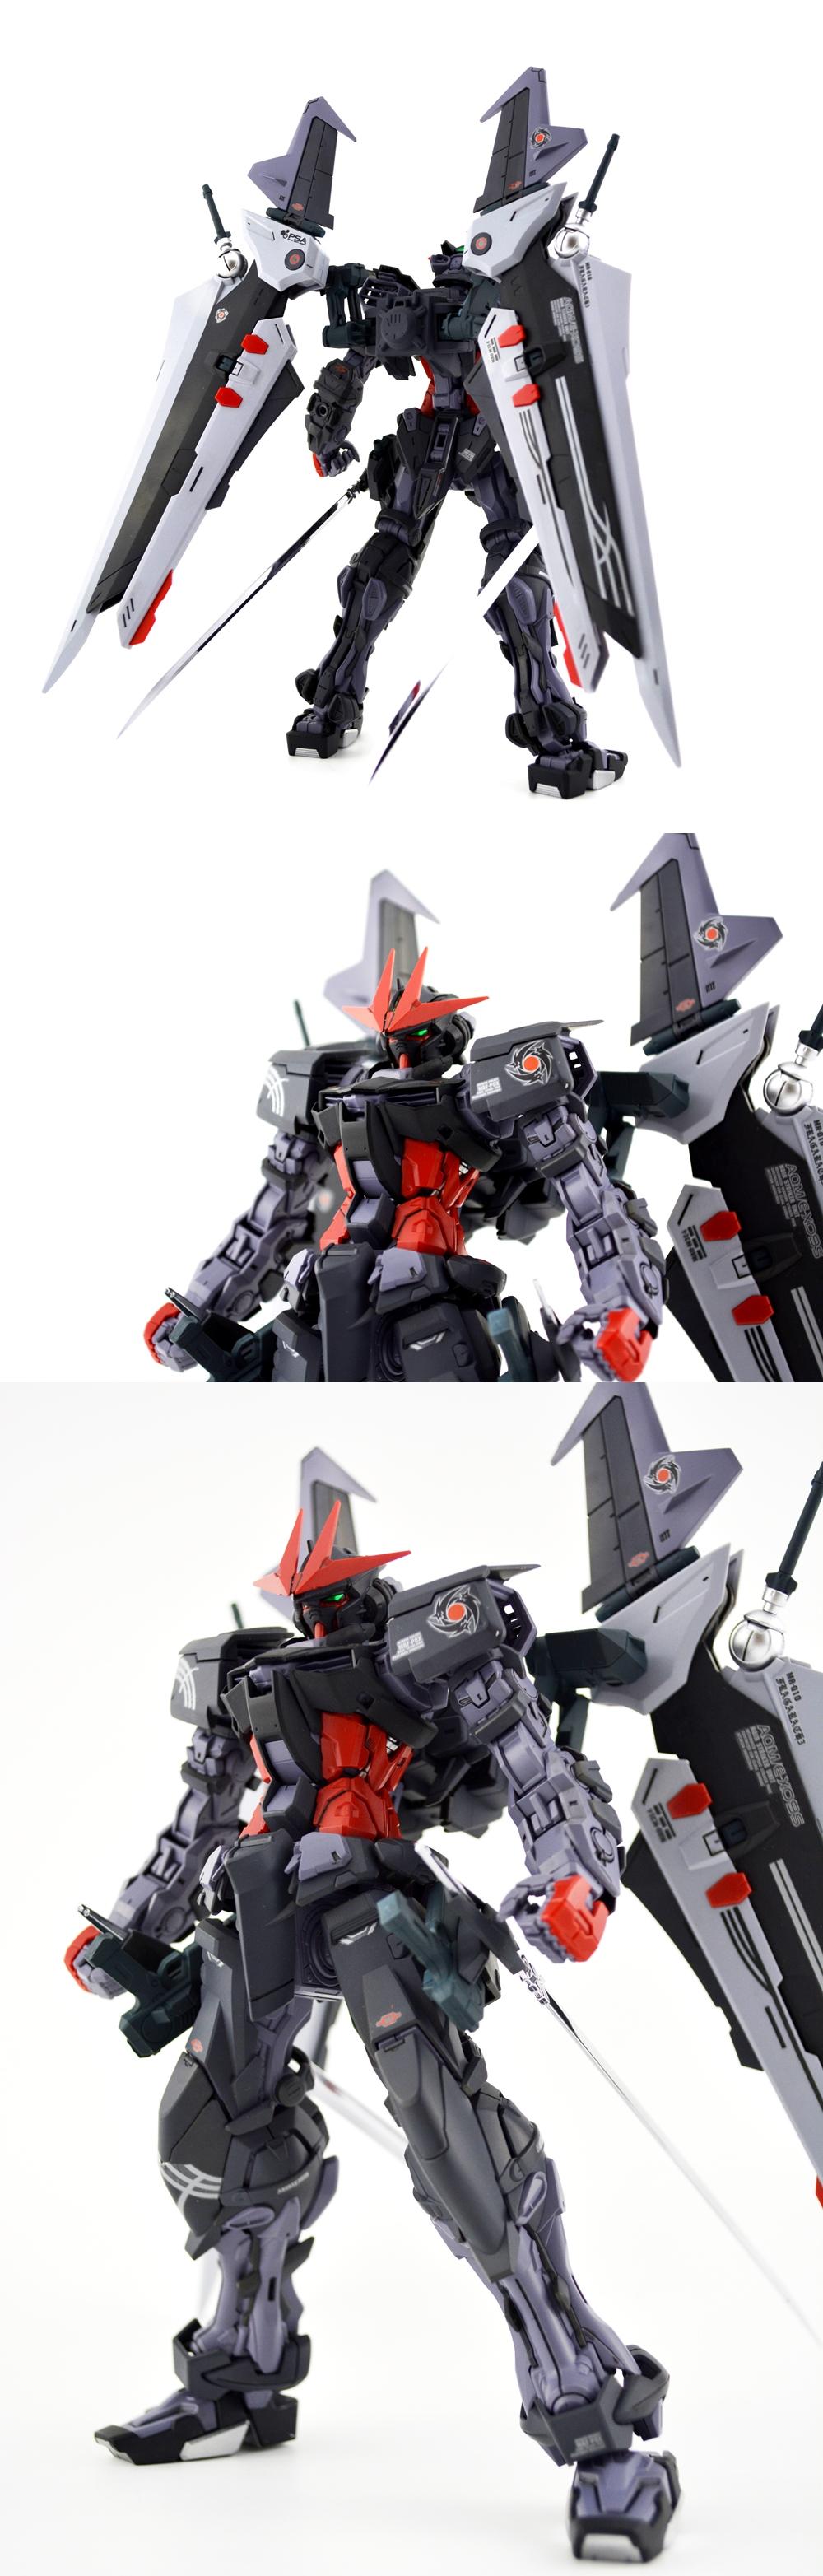 Gundam Astray Noir Wallpaper 20140524gpy3mru6